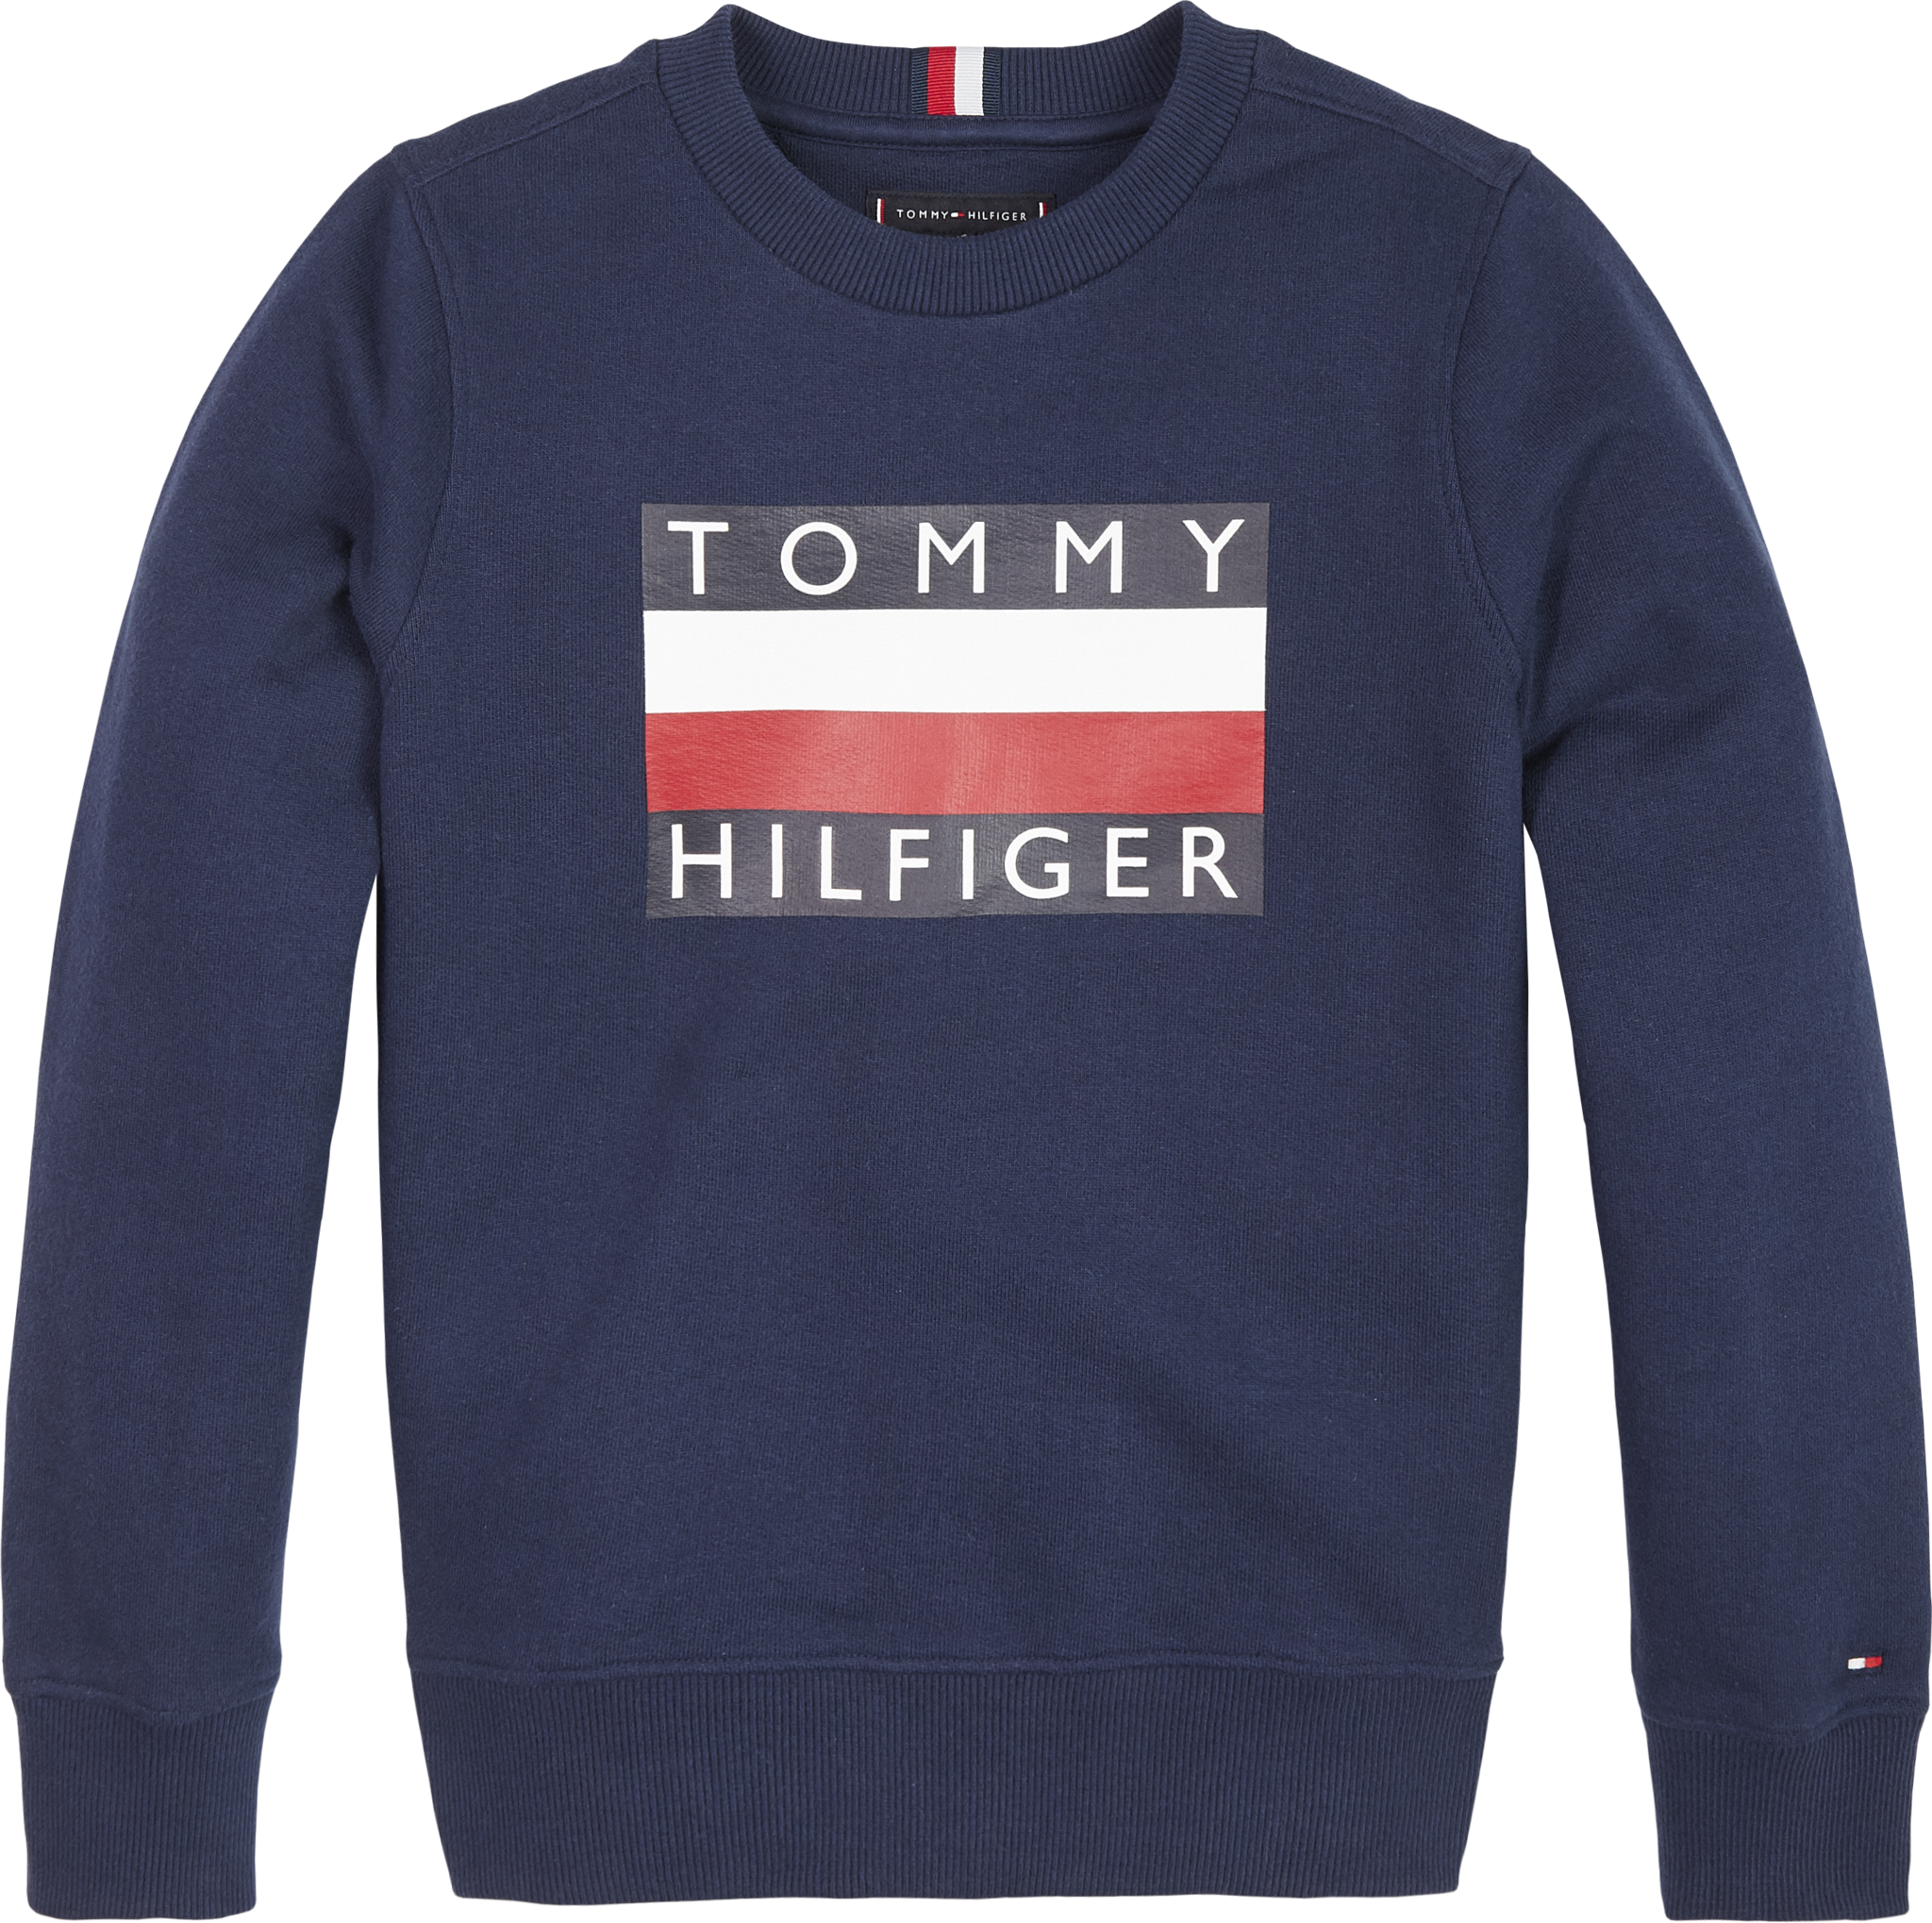 Tommy Hilfiger Ess Hilfiger S